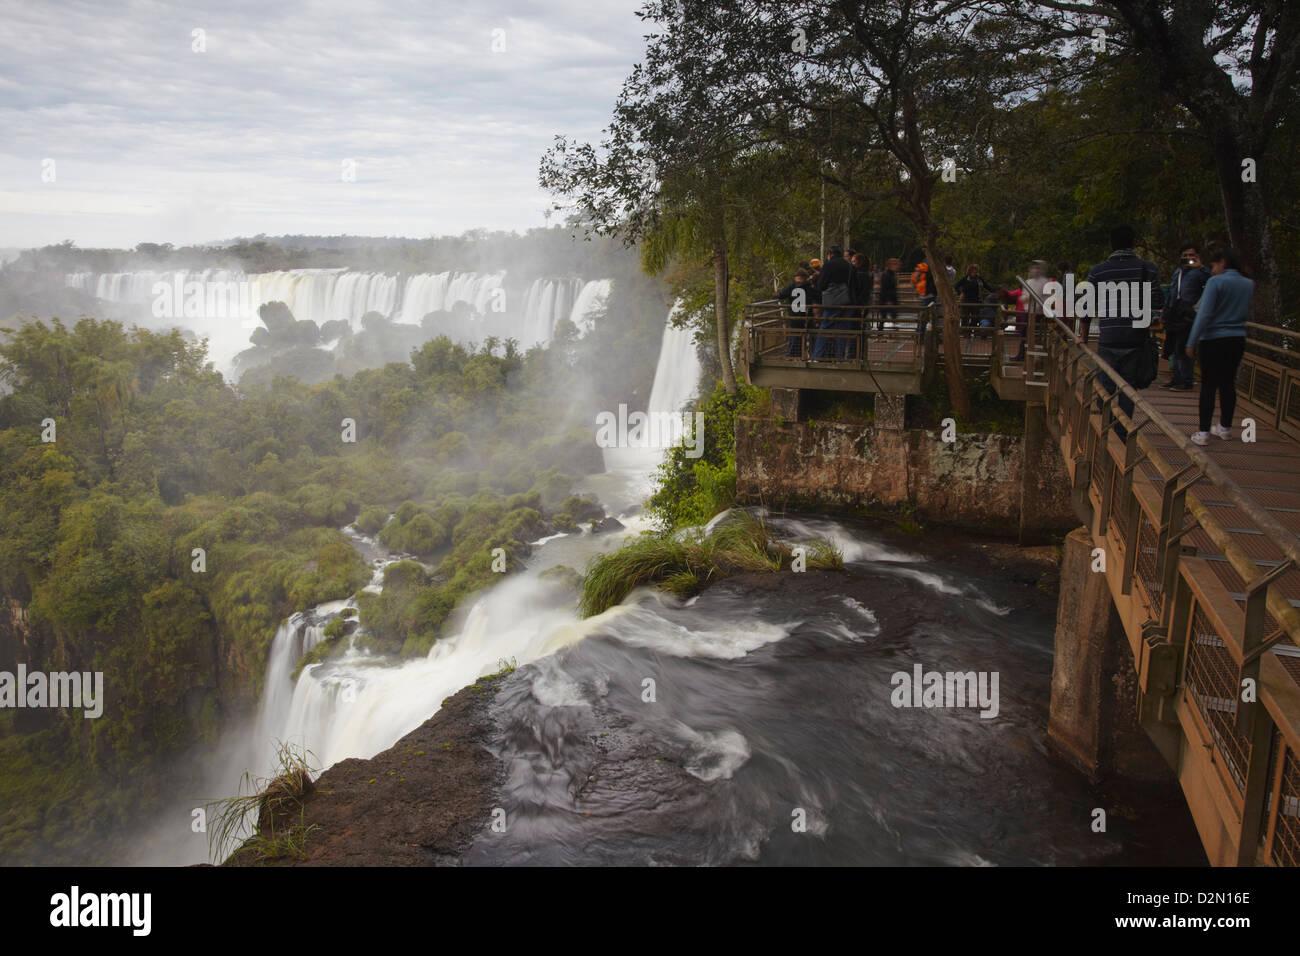 Tourists at Iguazu Falls, Iguazu National Park, UNESCO World Heritage Site, Misiones, Argentina, South America Stock Photo